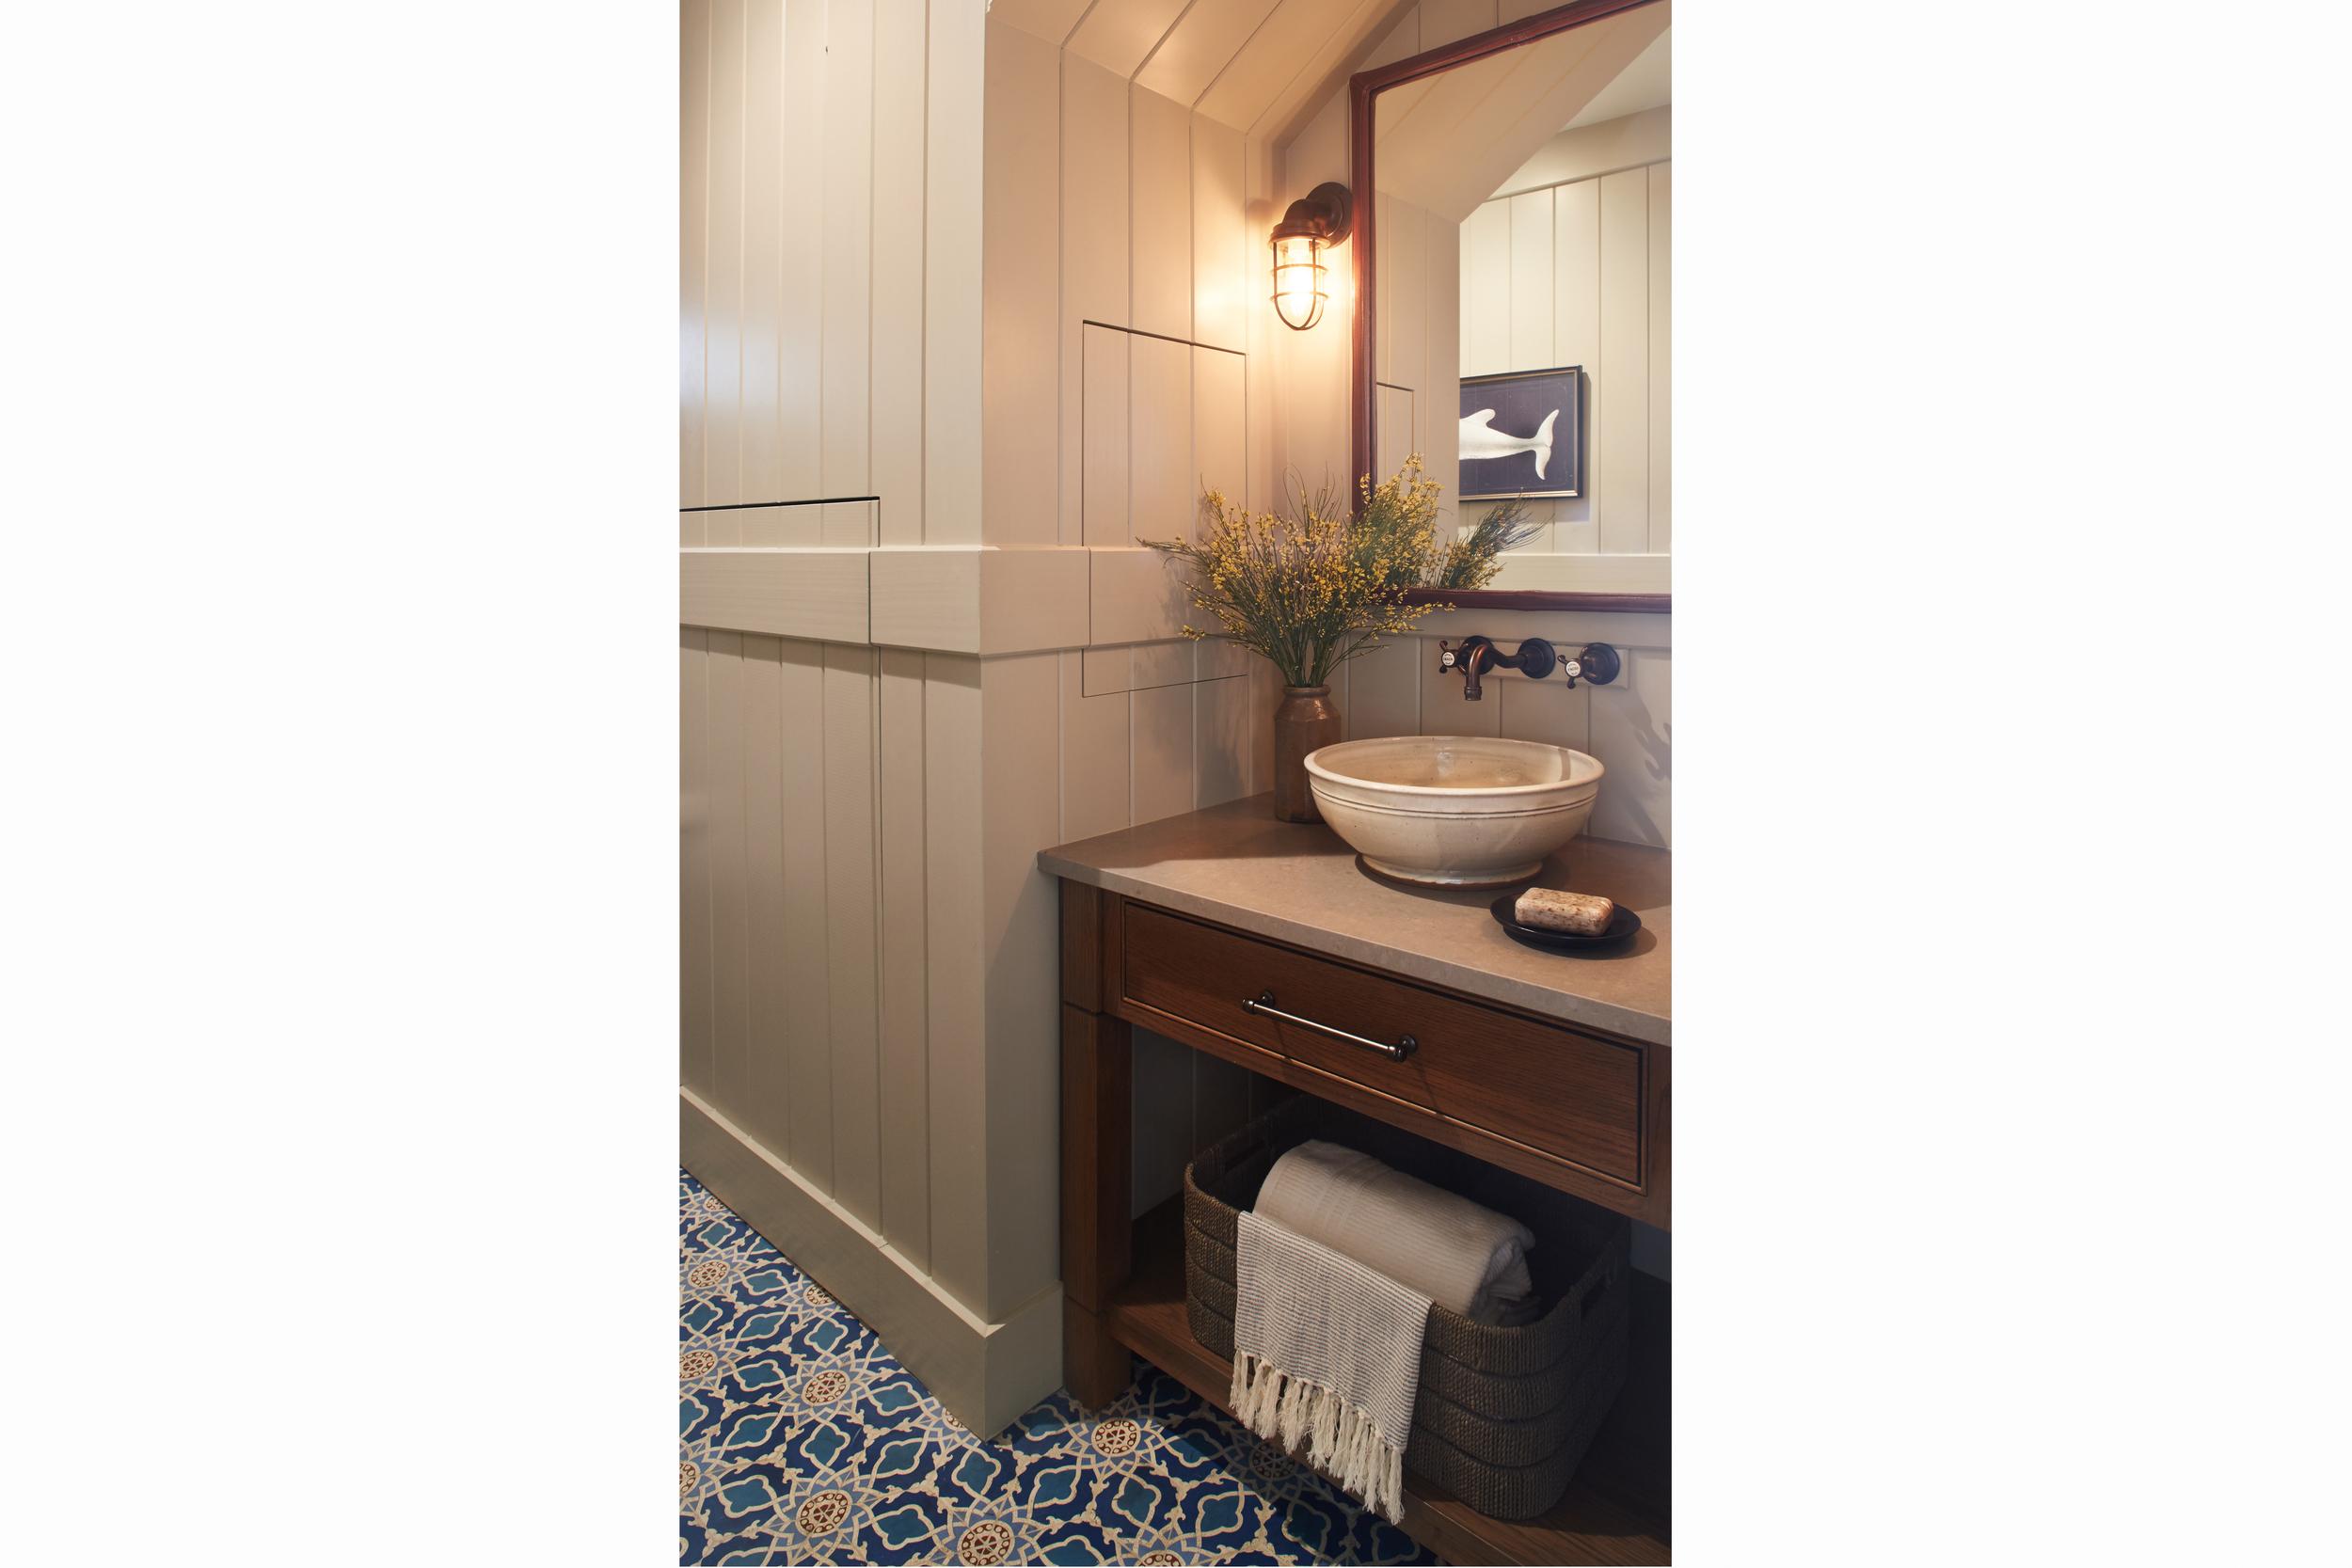 newport beach interior designer brittany stiles blue nautical powder bath.jpg